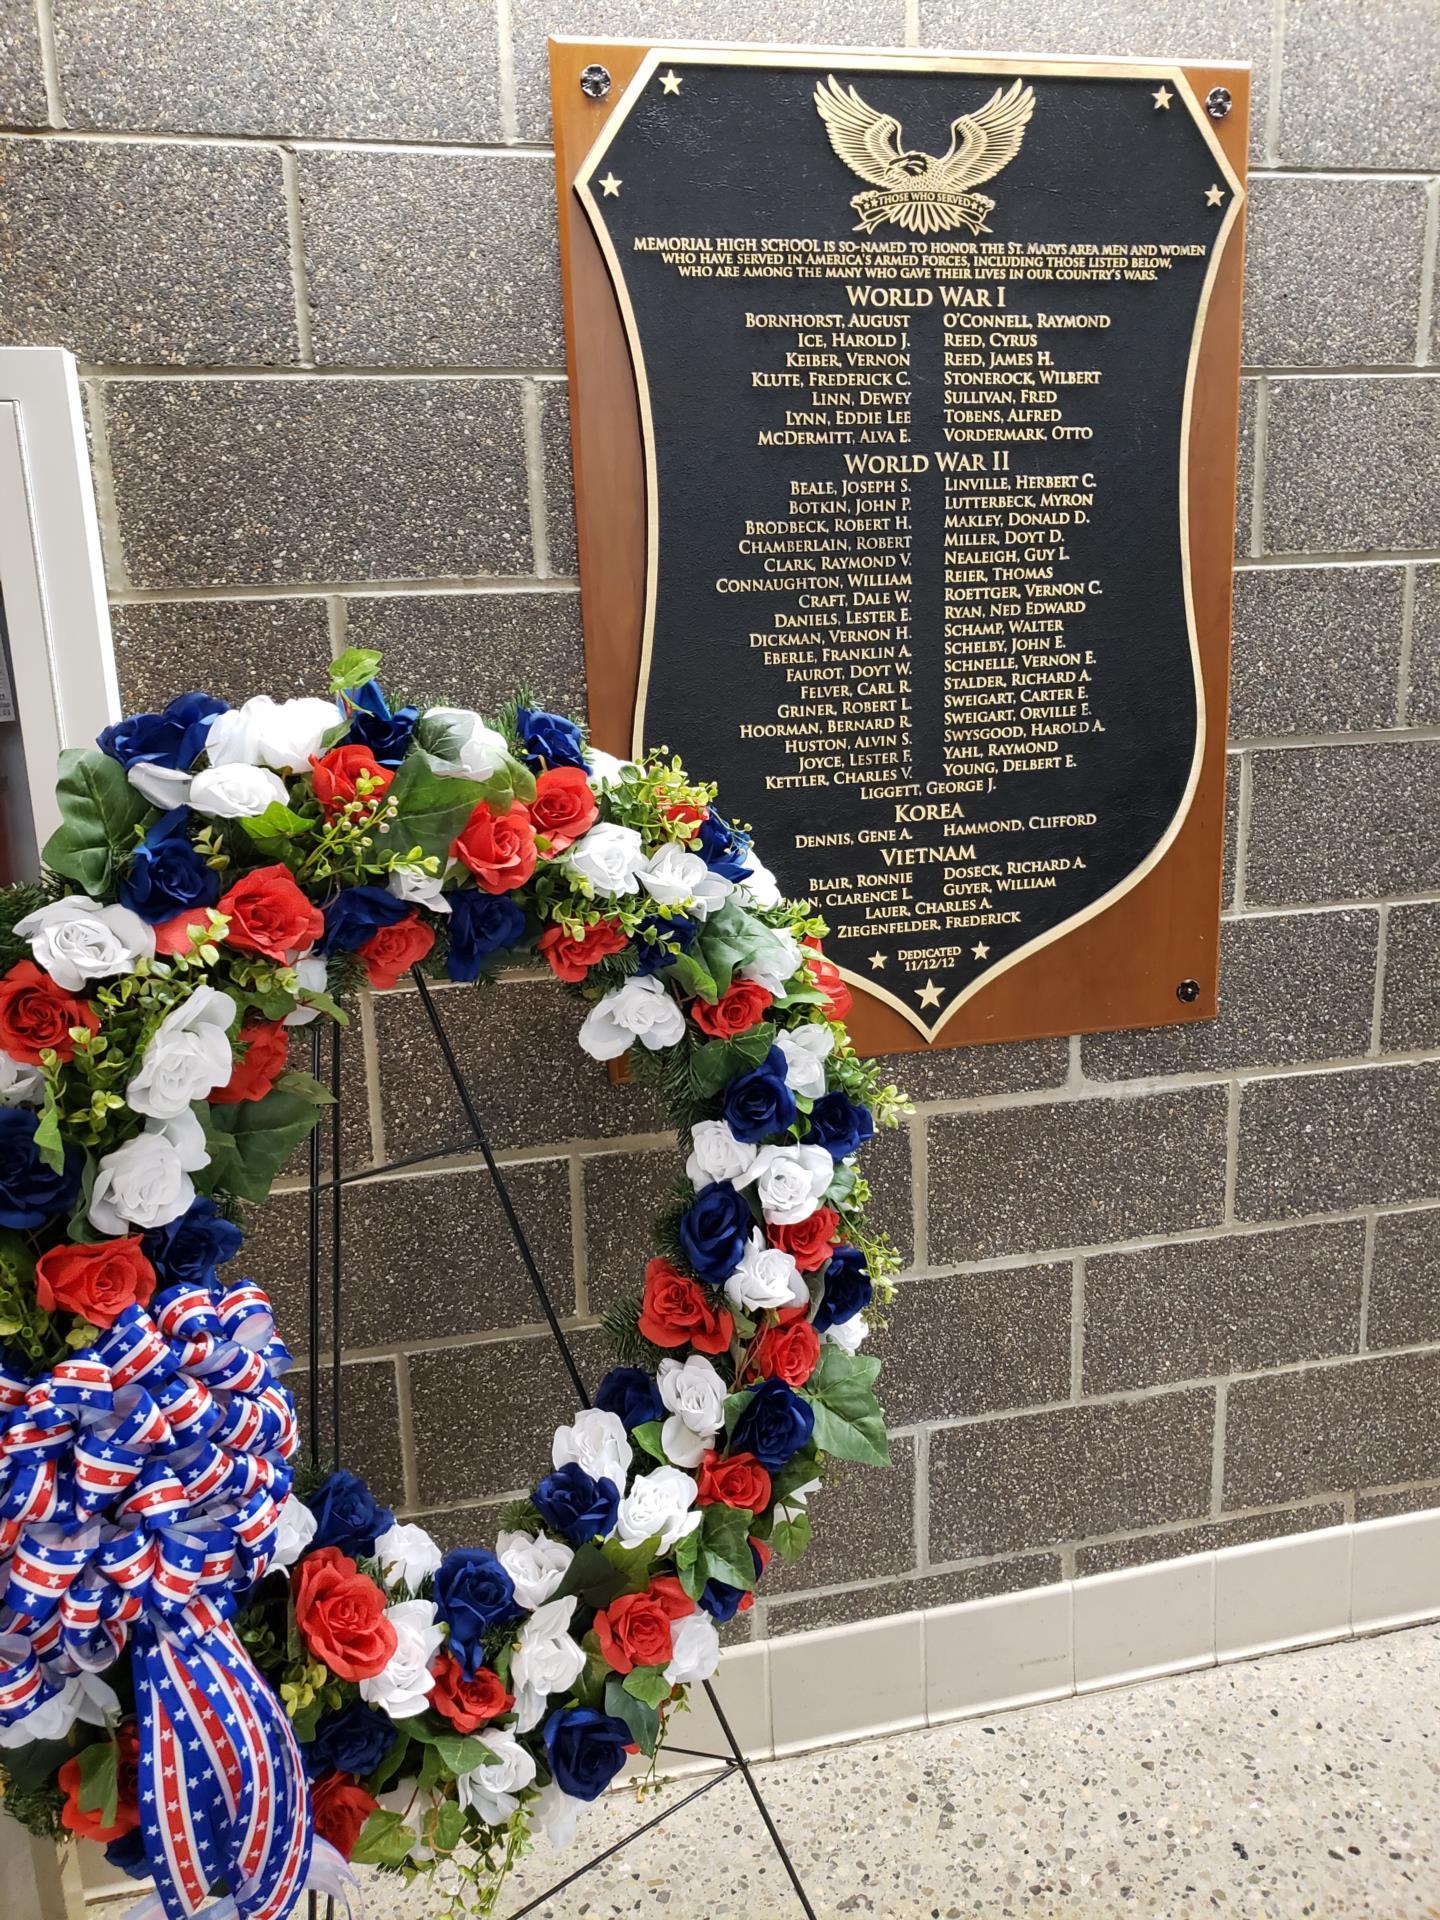 Wreath and dedication plaque